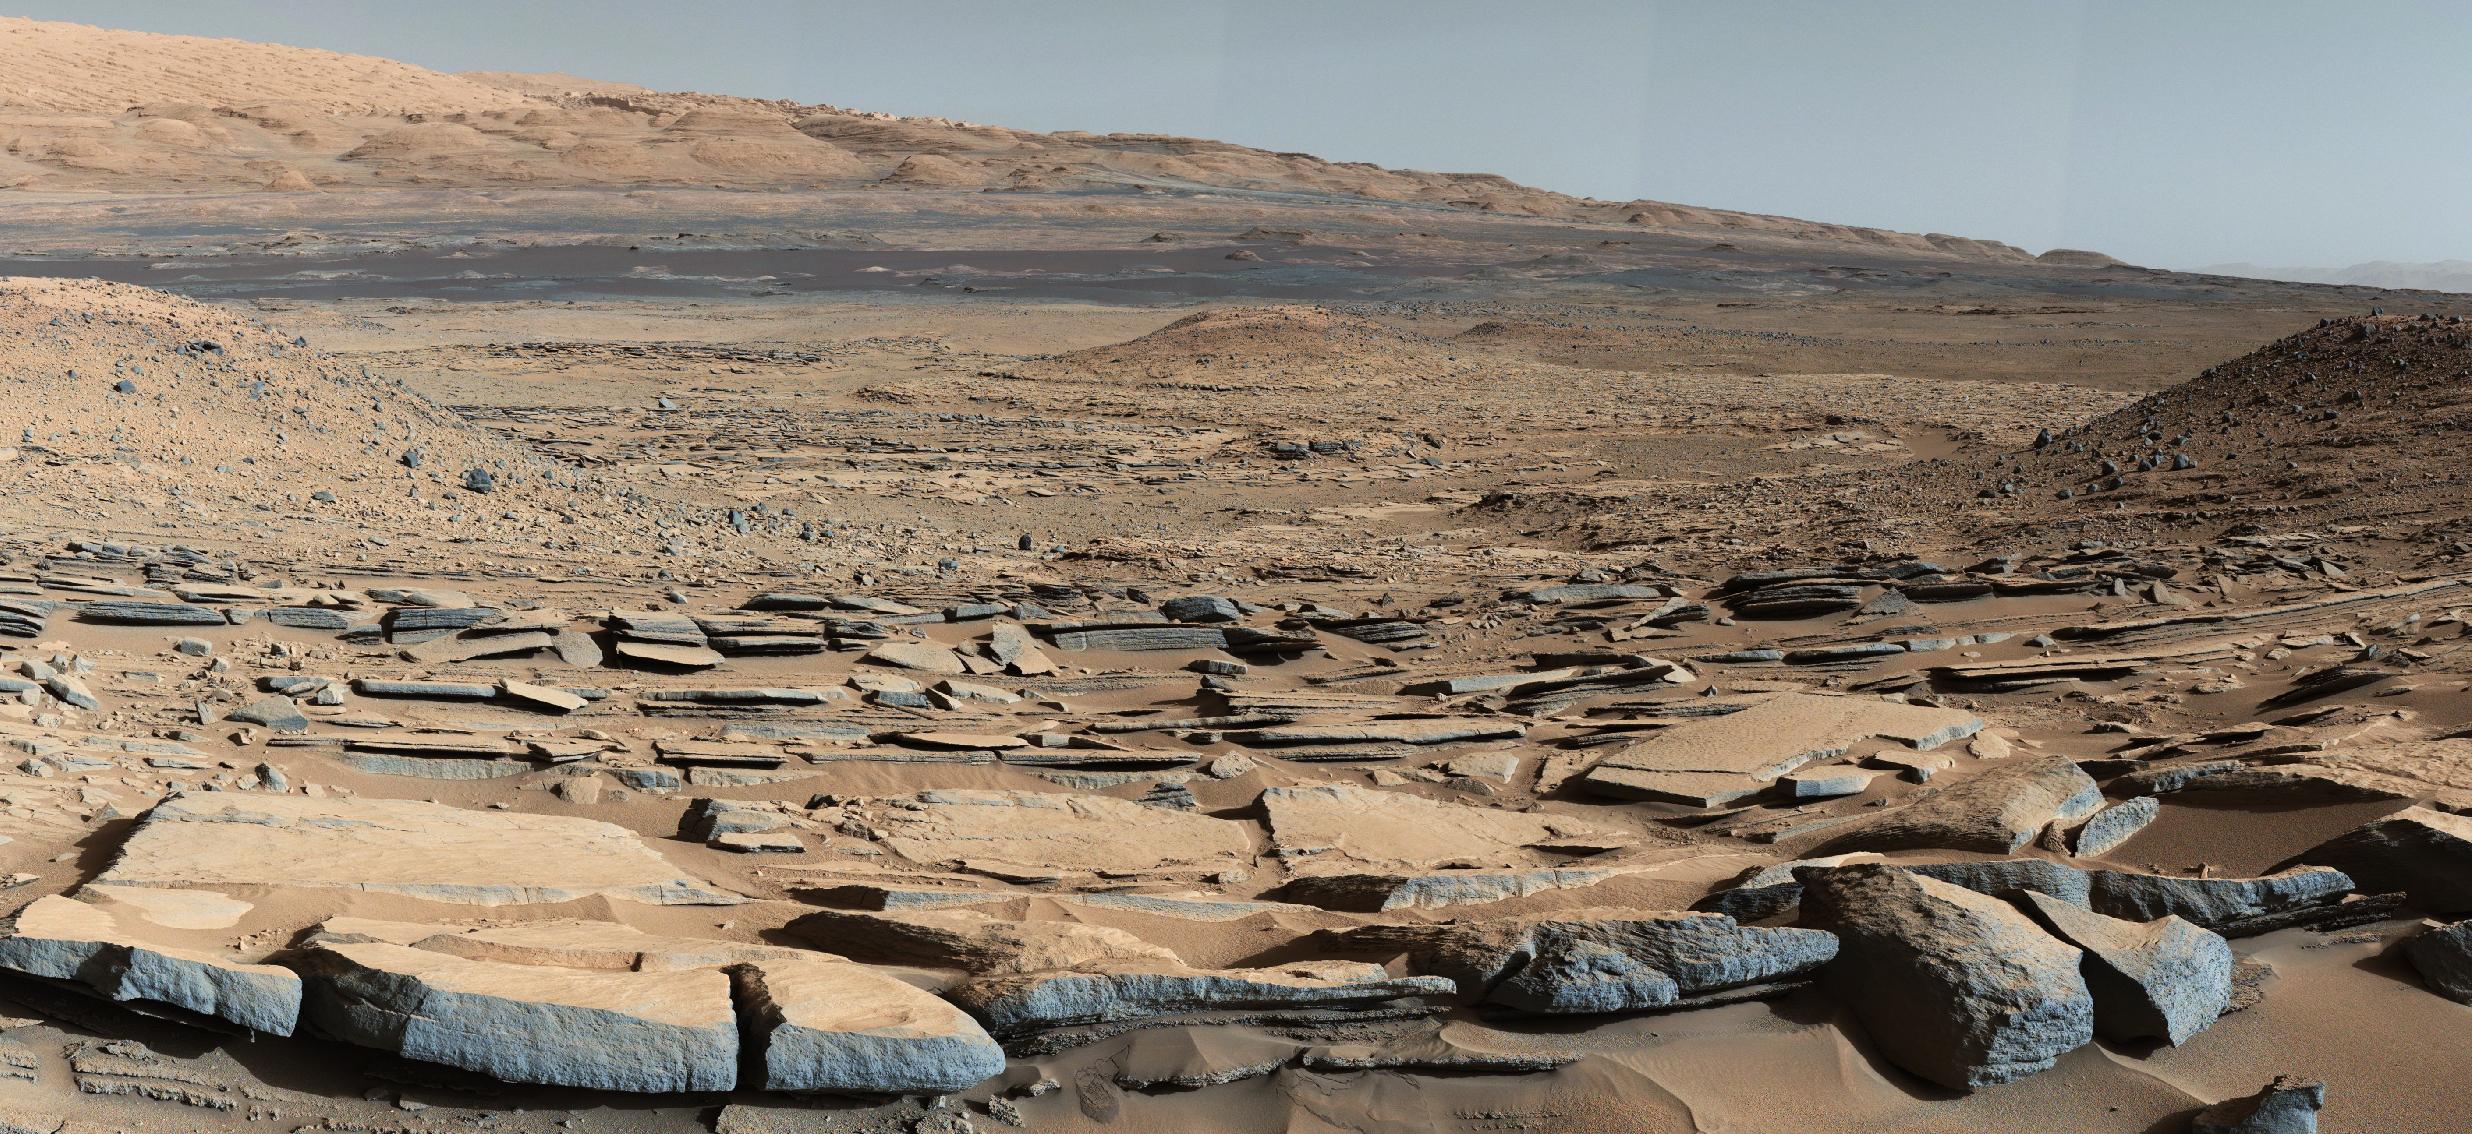 UFO enthusiasts believe that the barren landscape of Mars holds numerous secrets.